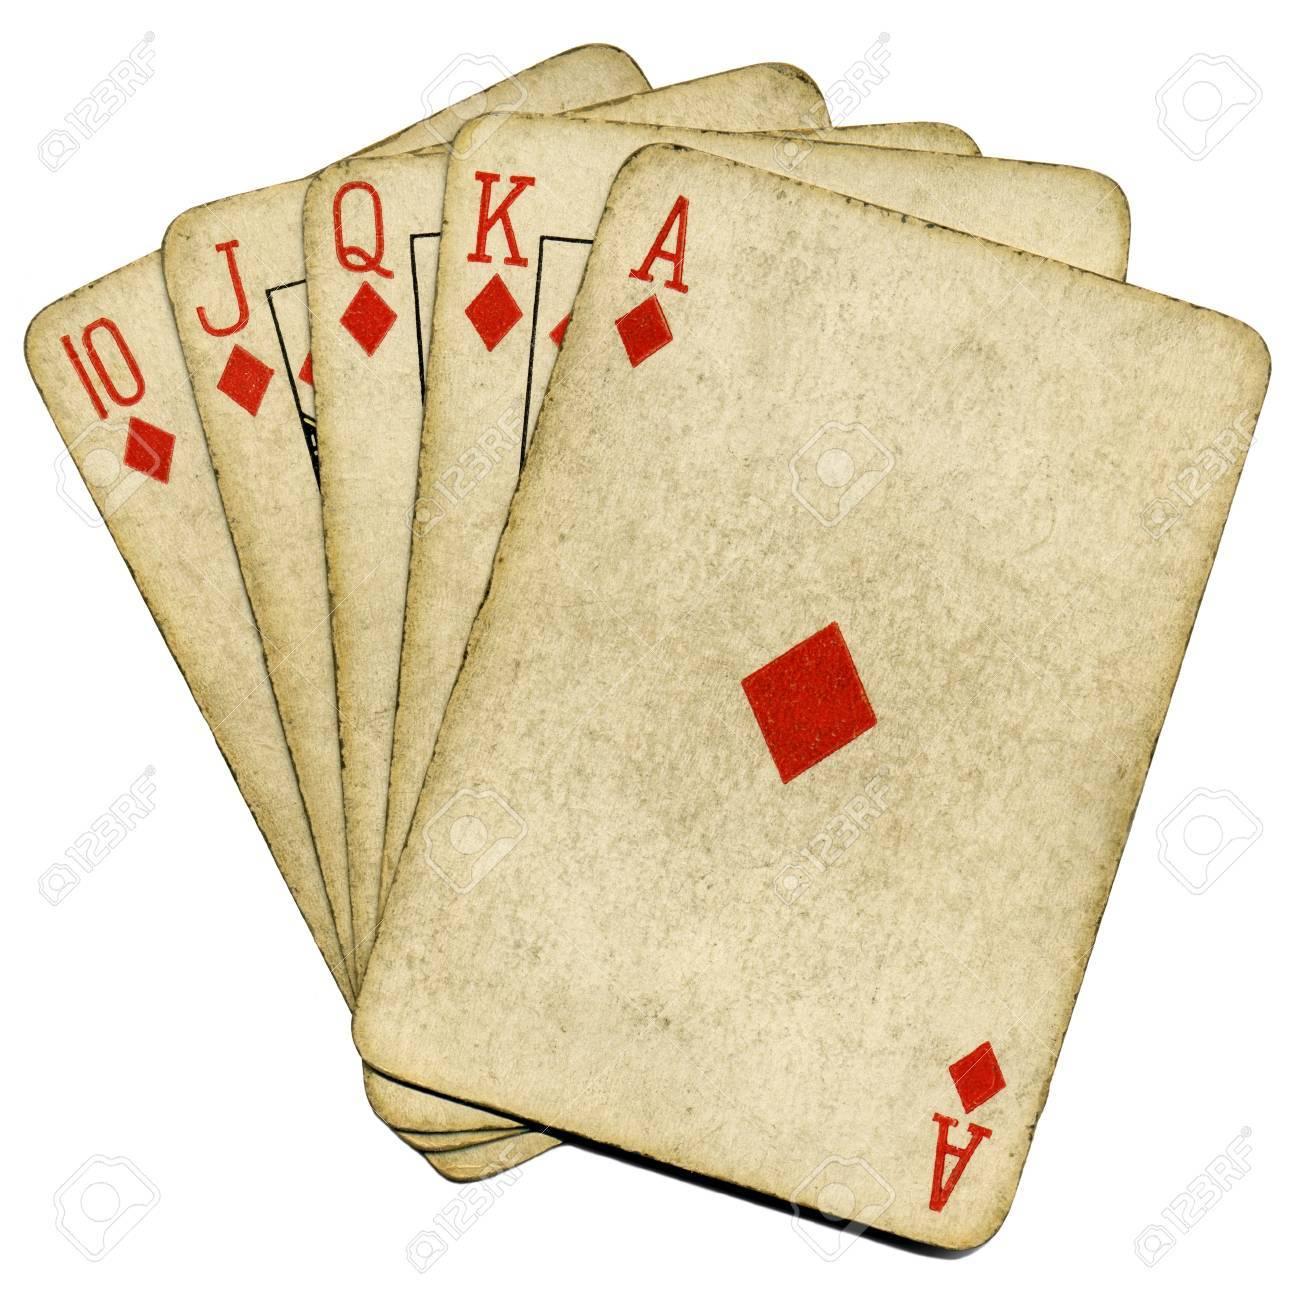 Royal flush old vintage poker cards isolated over white. Stock Photo - 4153200